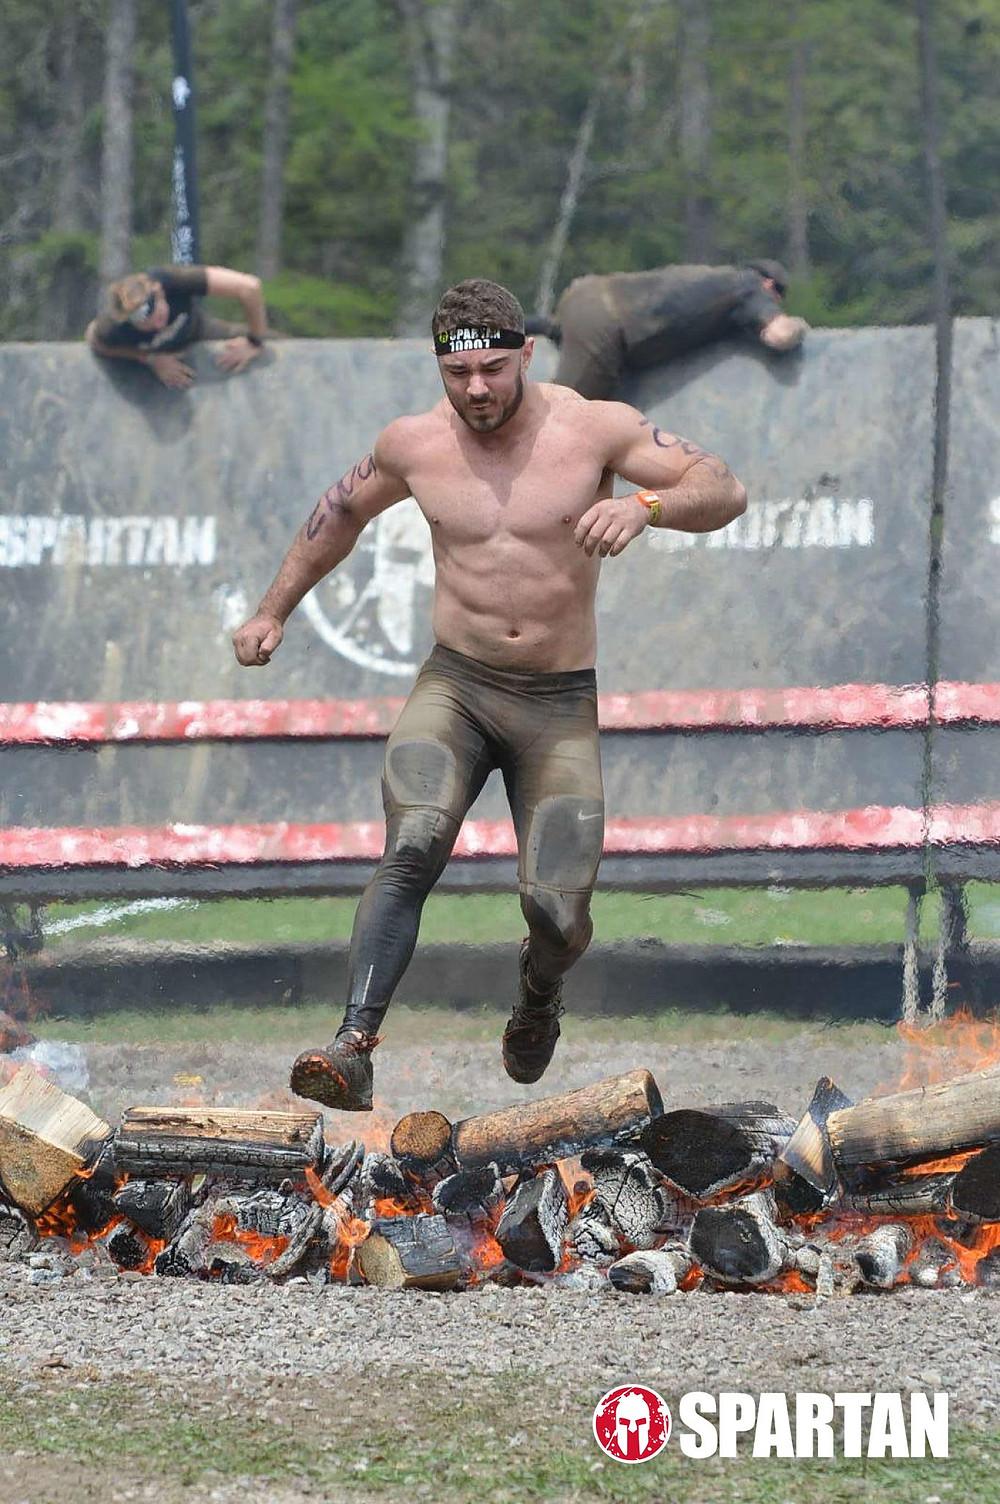 Bryce boepple finishing Montana spartan race